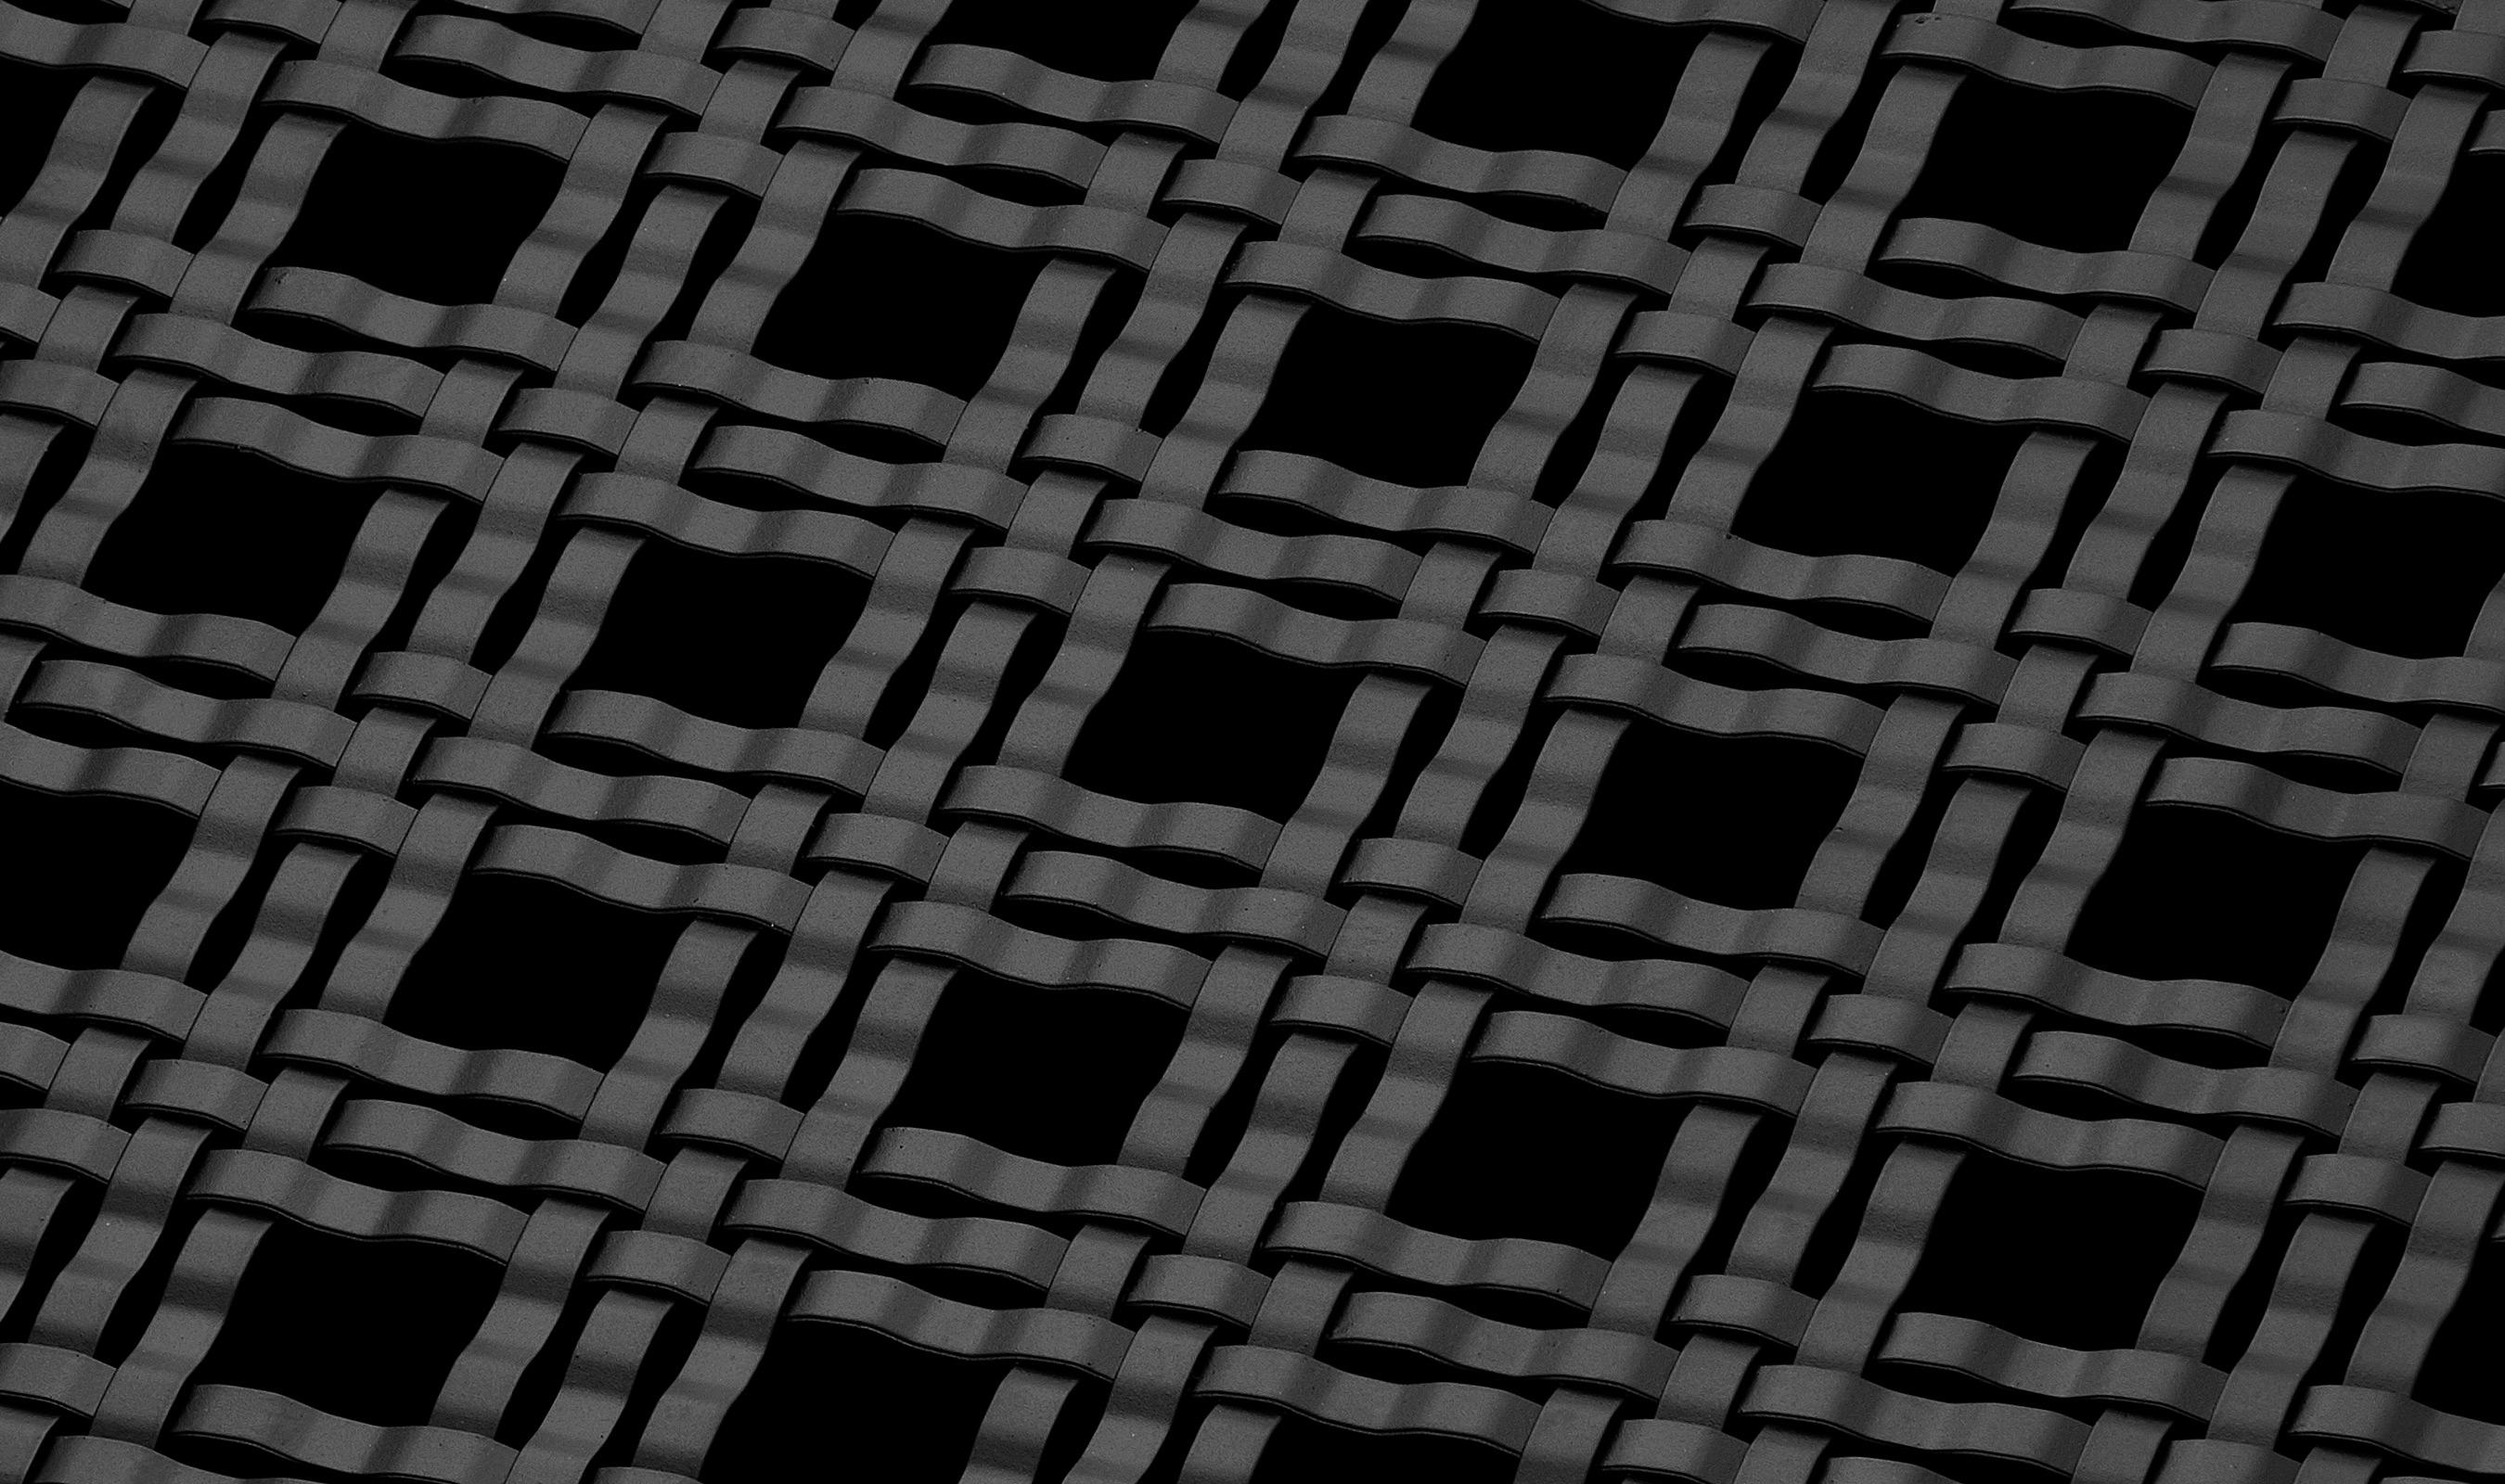 M33-5 Raven Black powder coated decorative wire mesh